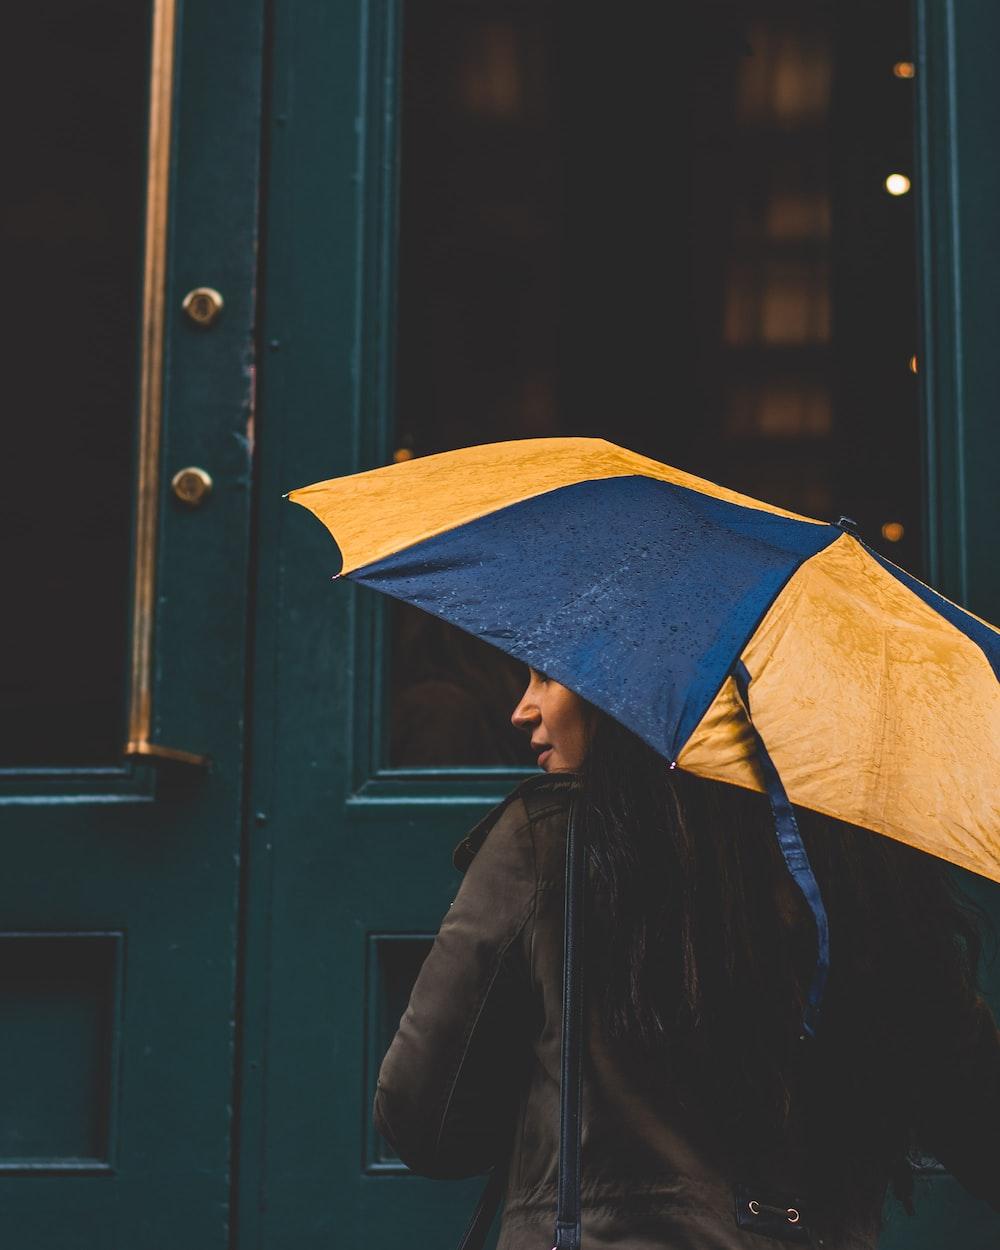 Alone 55 Best Free Woman Girl And Portrait Photos On Unsplash Bagus Umbrella Medium Maroon Under Yellow Blue Beside Green Wooden Door